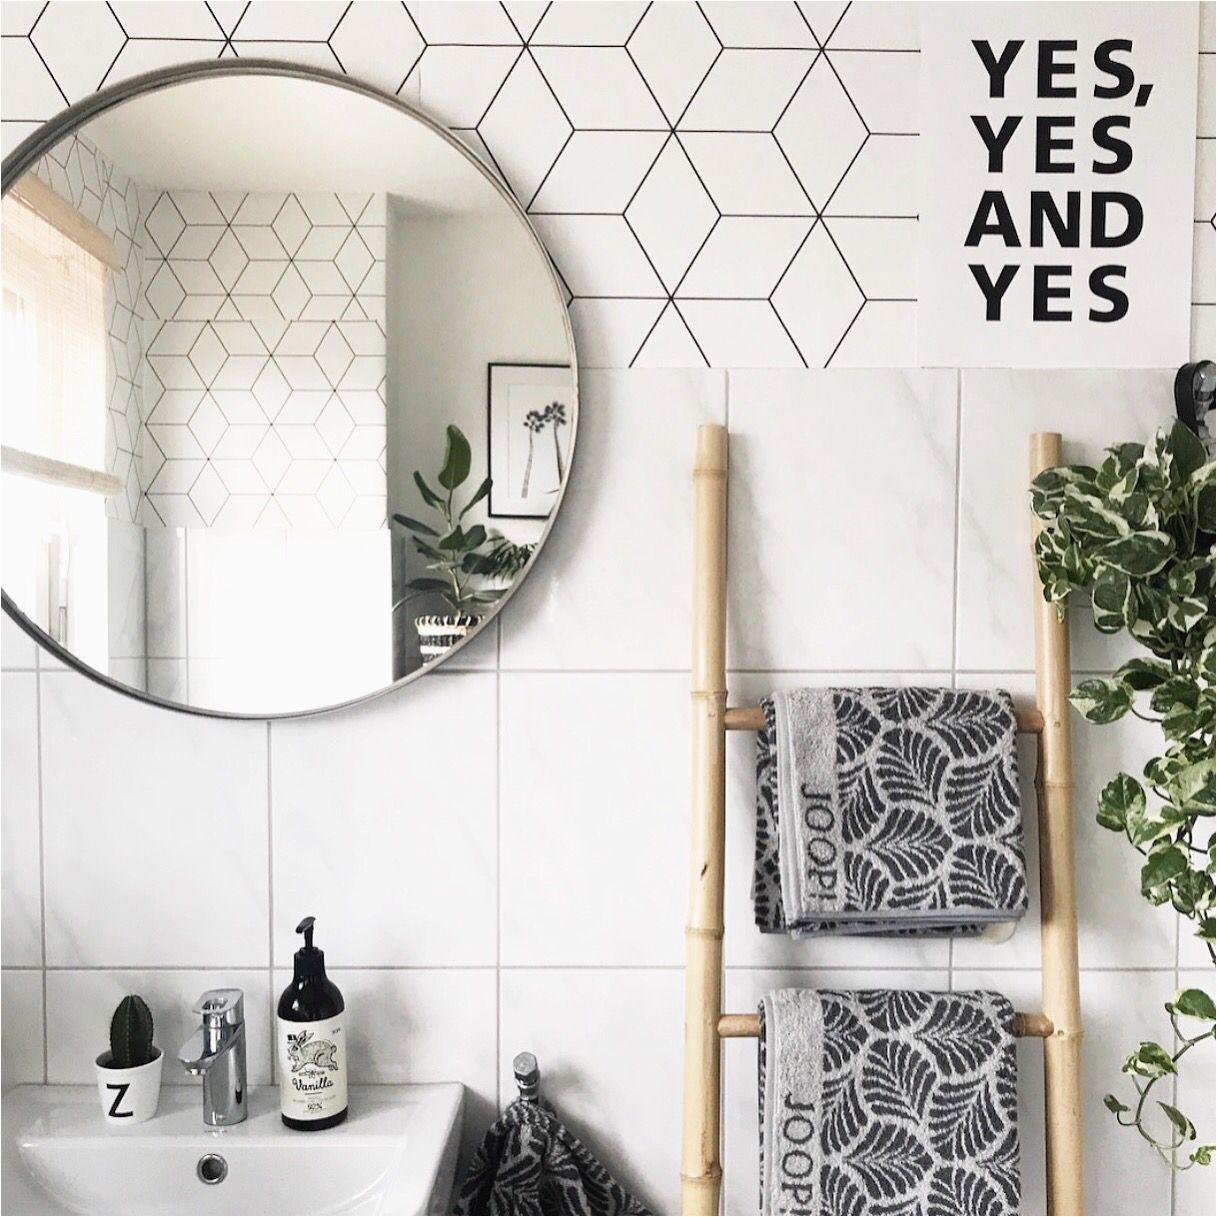 Deko Ideen Badezimmer Wand 3 X Badezimmer Deko Ideen Zur Inspiration